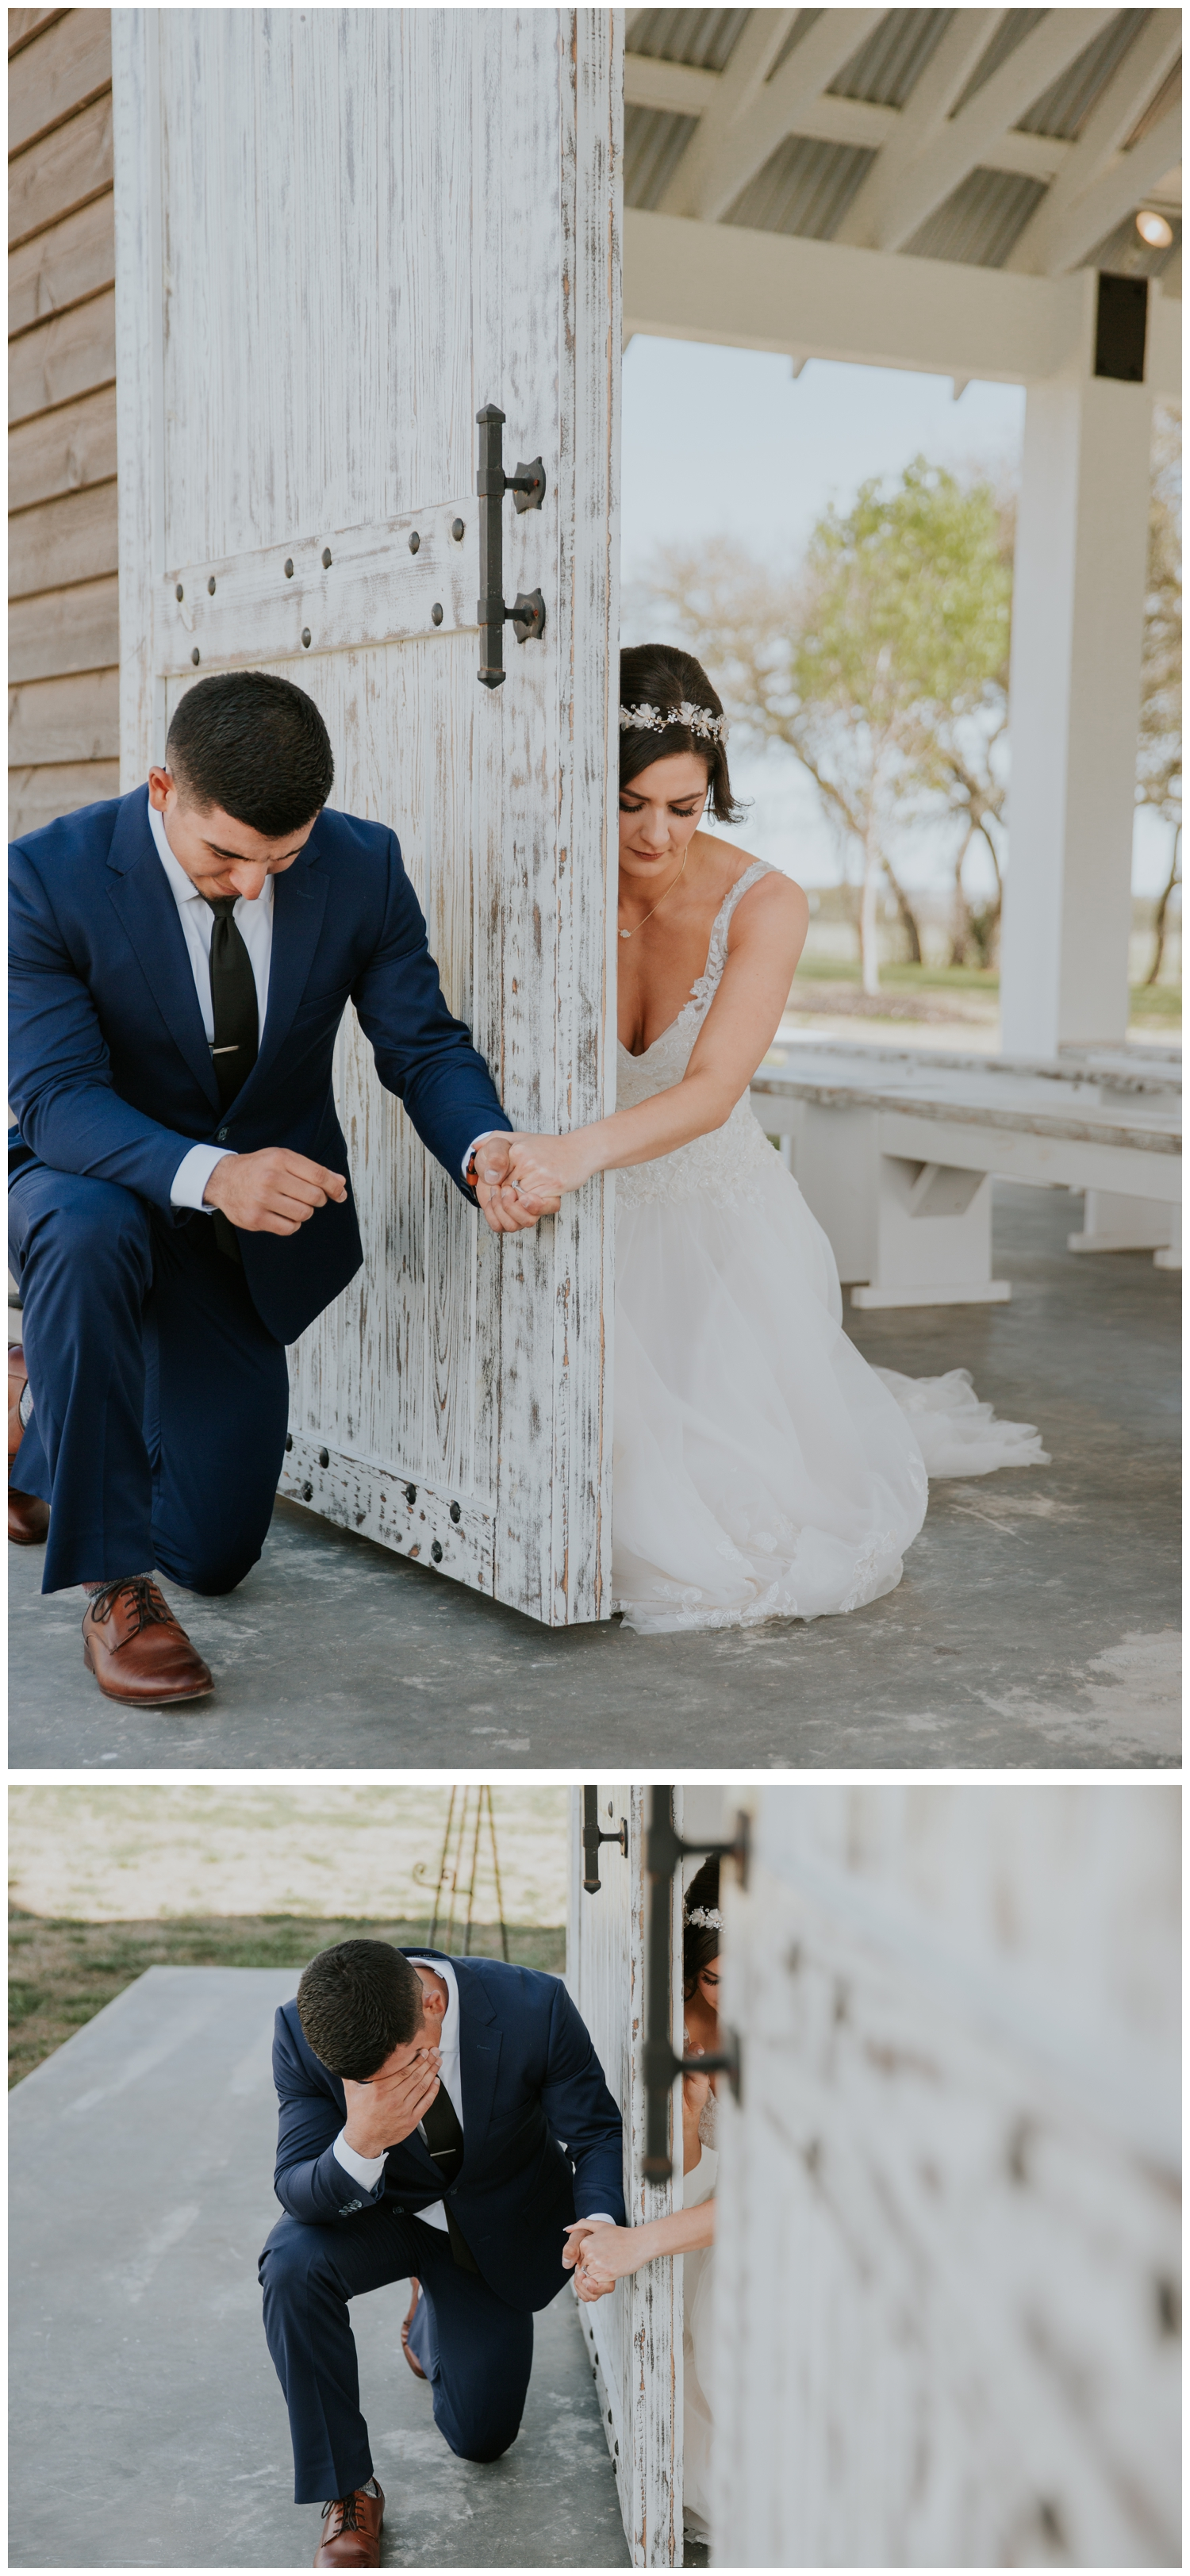 Ashlee+Mike, Featherstone Ranch Spring Wedding, San Antonio, Contista Productions Wedding Photography_0007.jpg